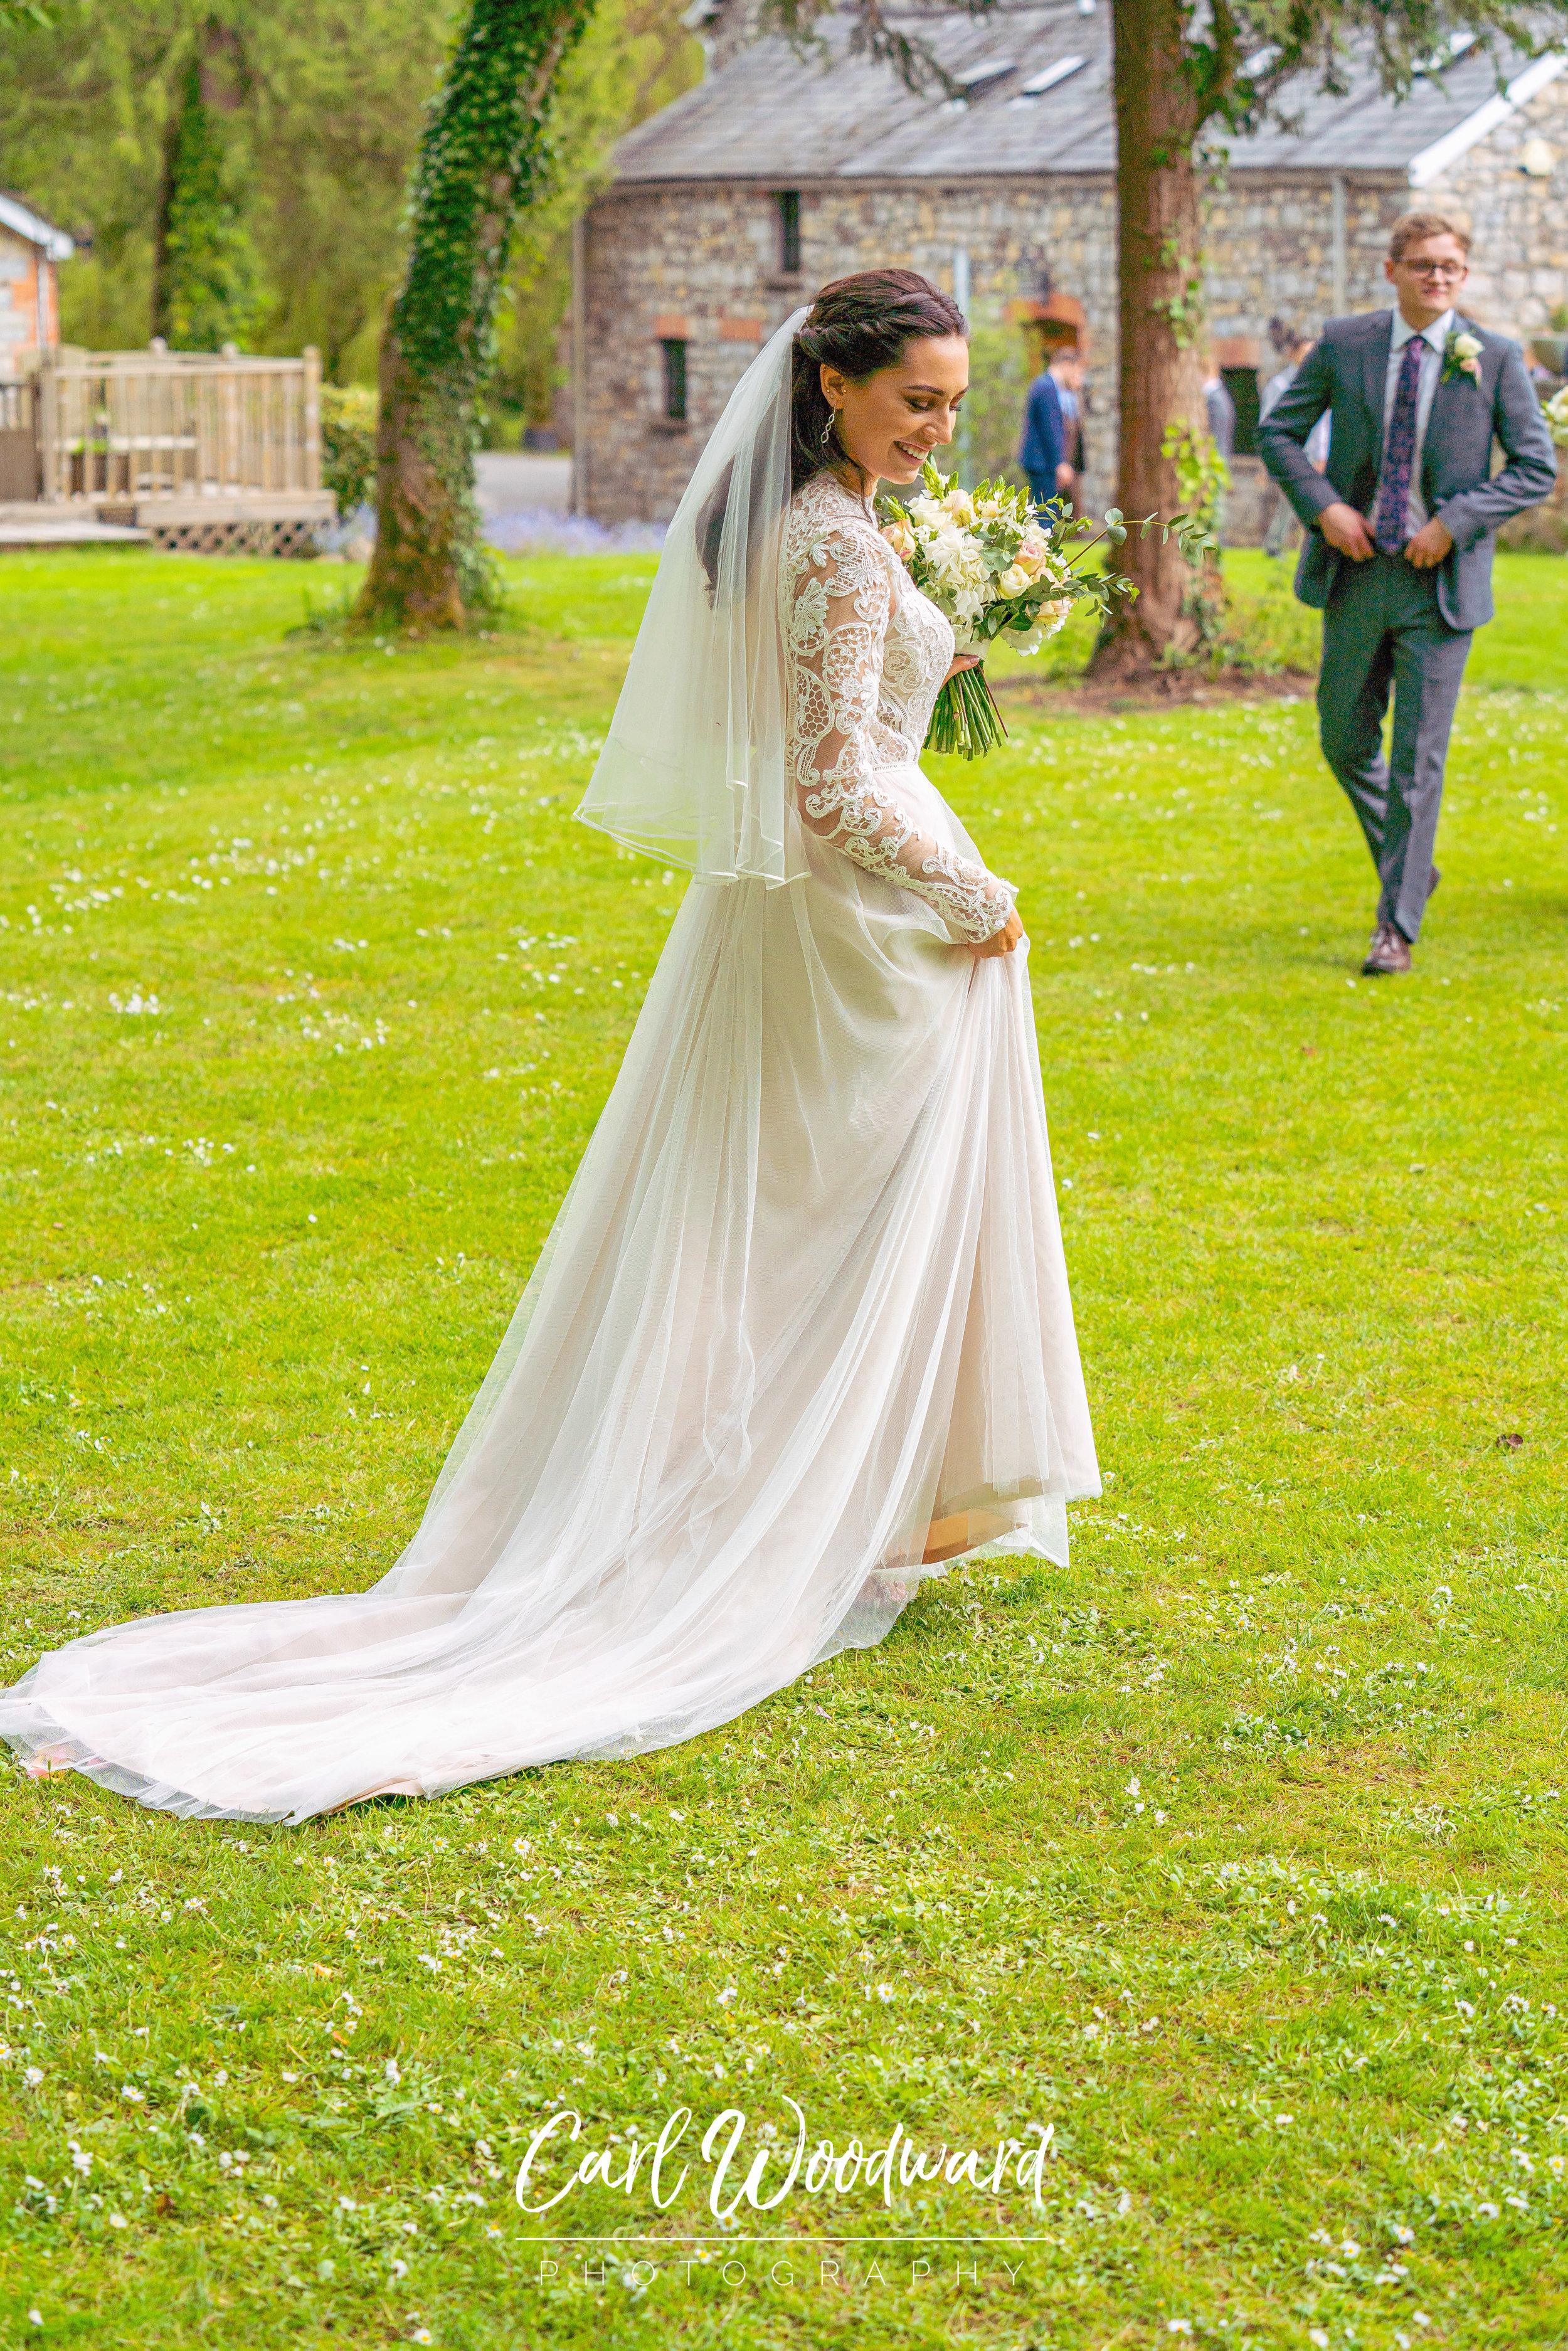 013-pencoed-house-estate-wedding-wedding-photography-cardiff-wedding-photographer.jpg